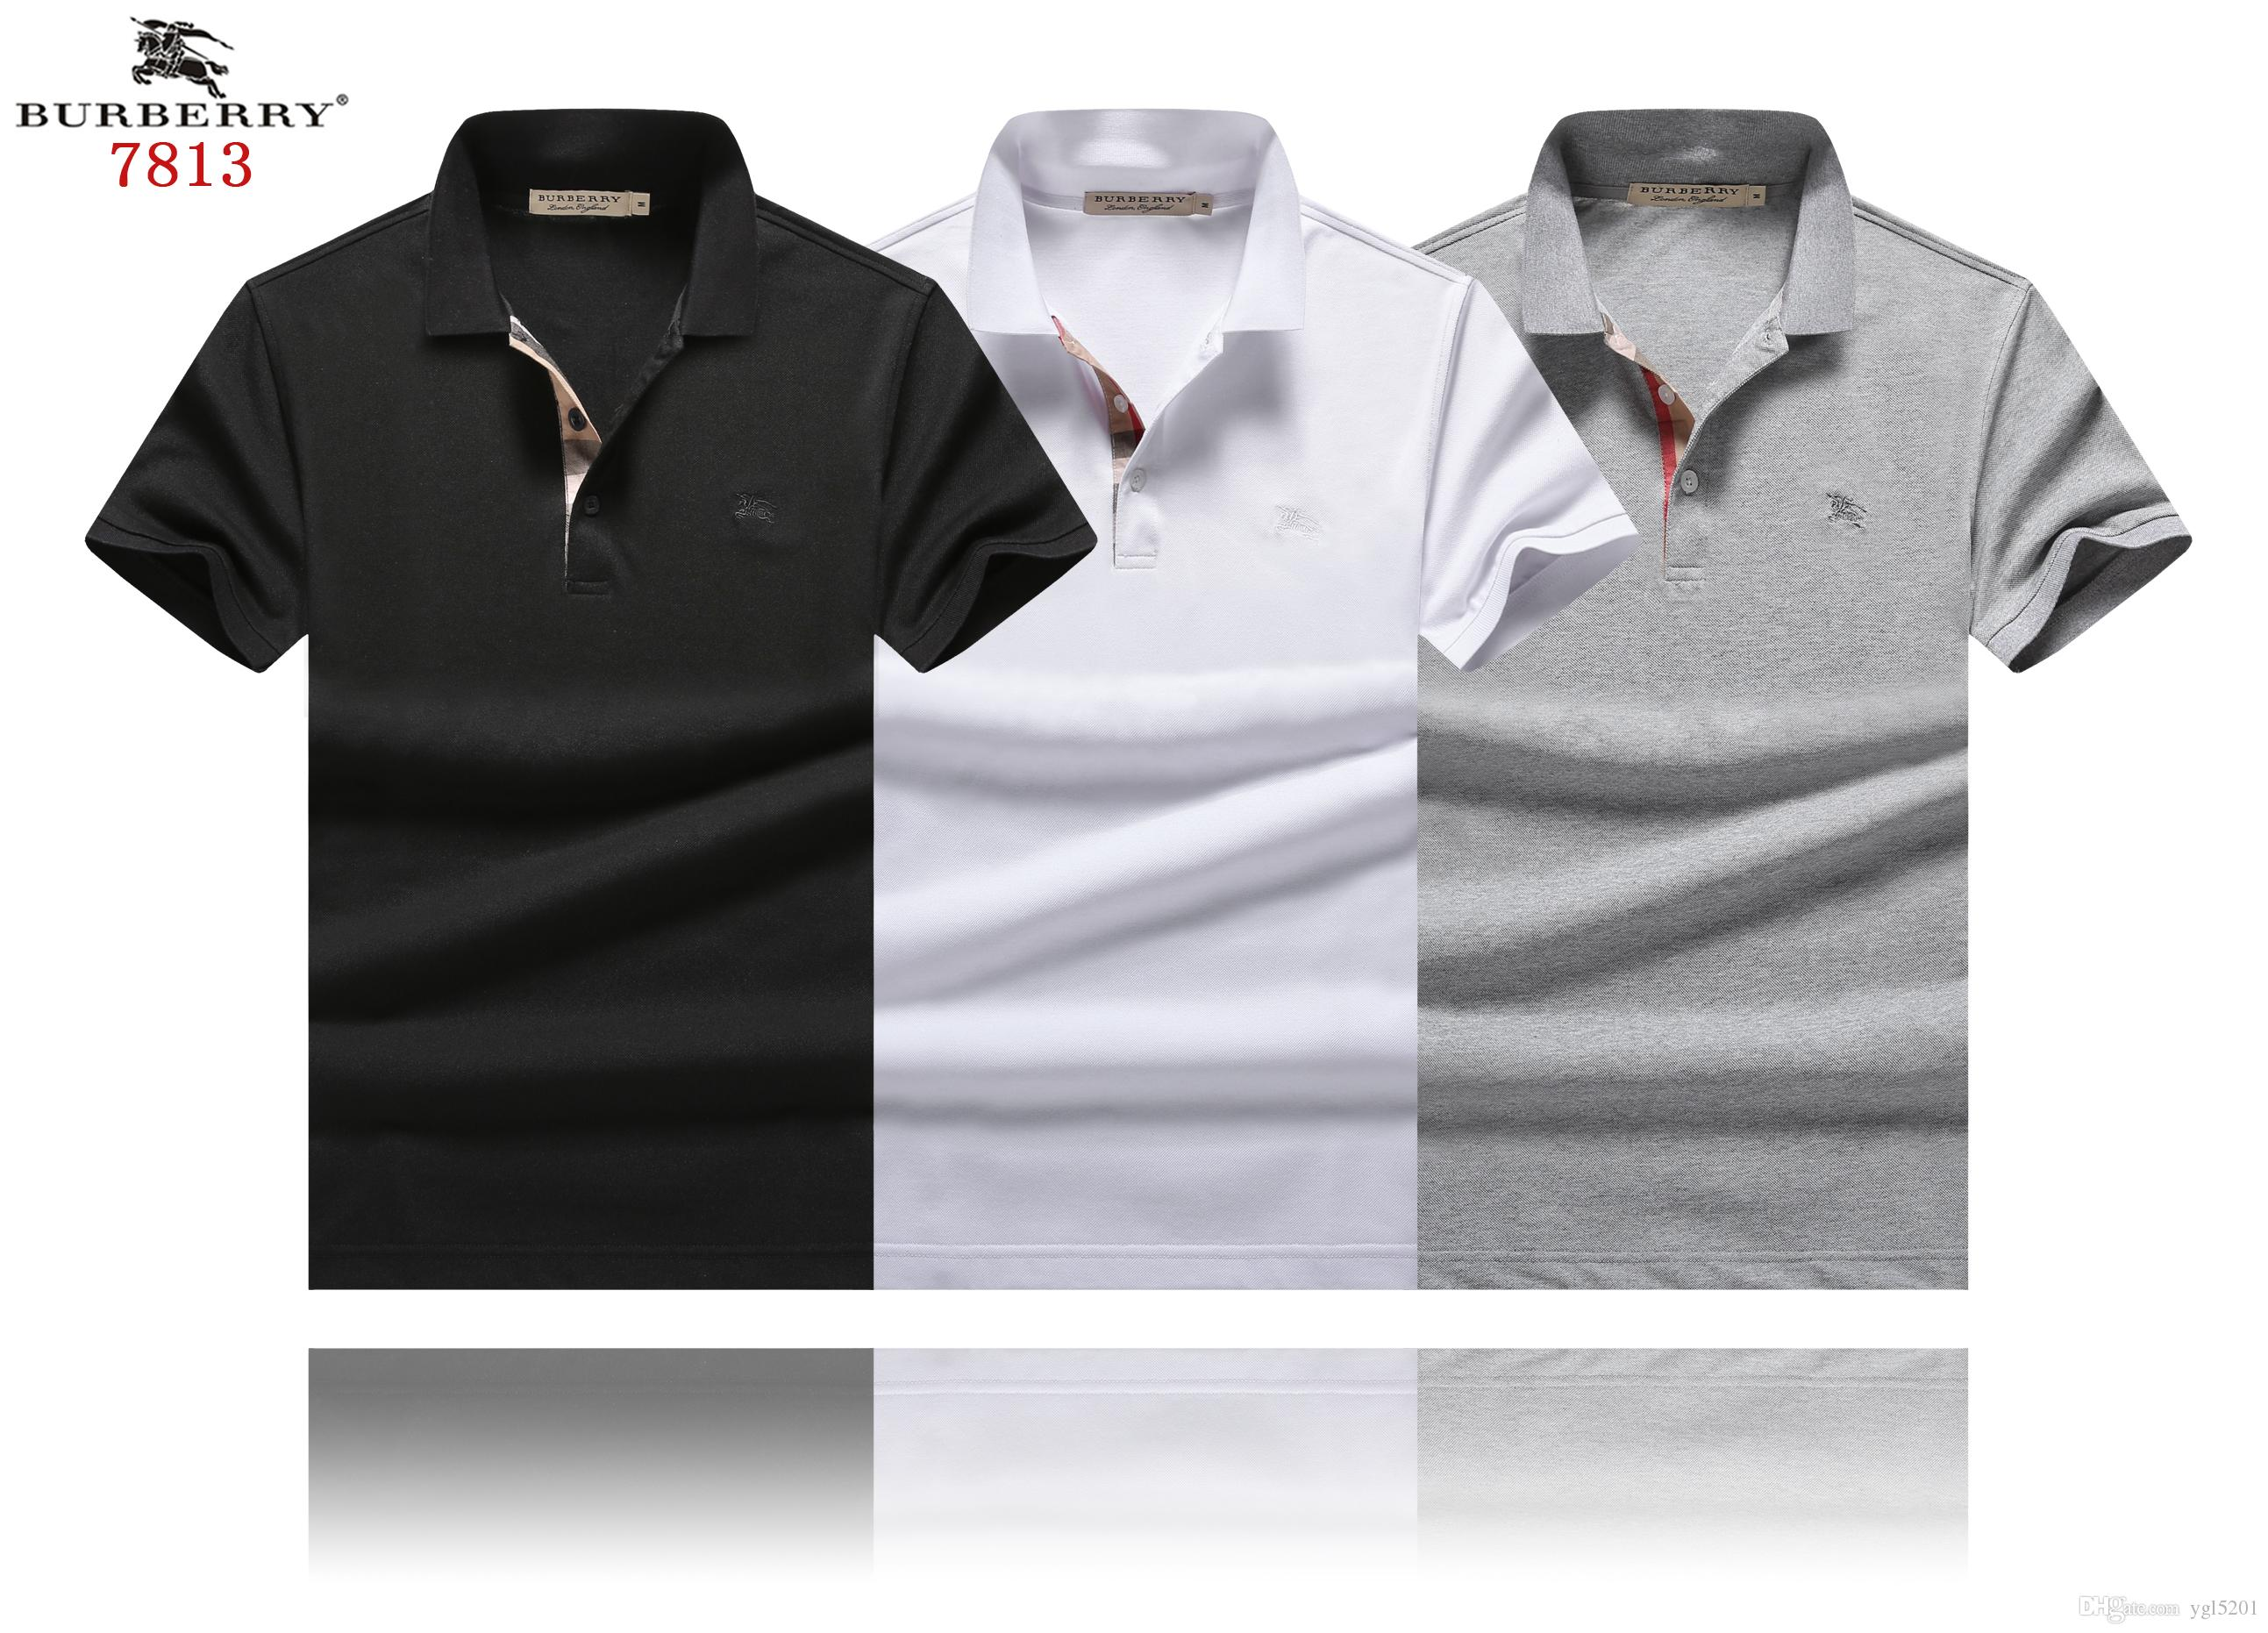 60c36b079322bf 2019 New 2019 GB Luxury Brand Designer Classic Plaid Summer Men S Polo  Shirts BUR005 England Fashion Casual Cotton Short Sleeve Men Lapel T Shirt  From ...